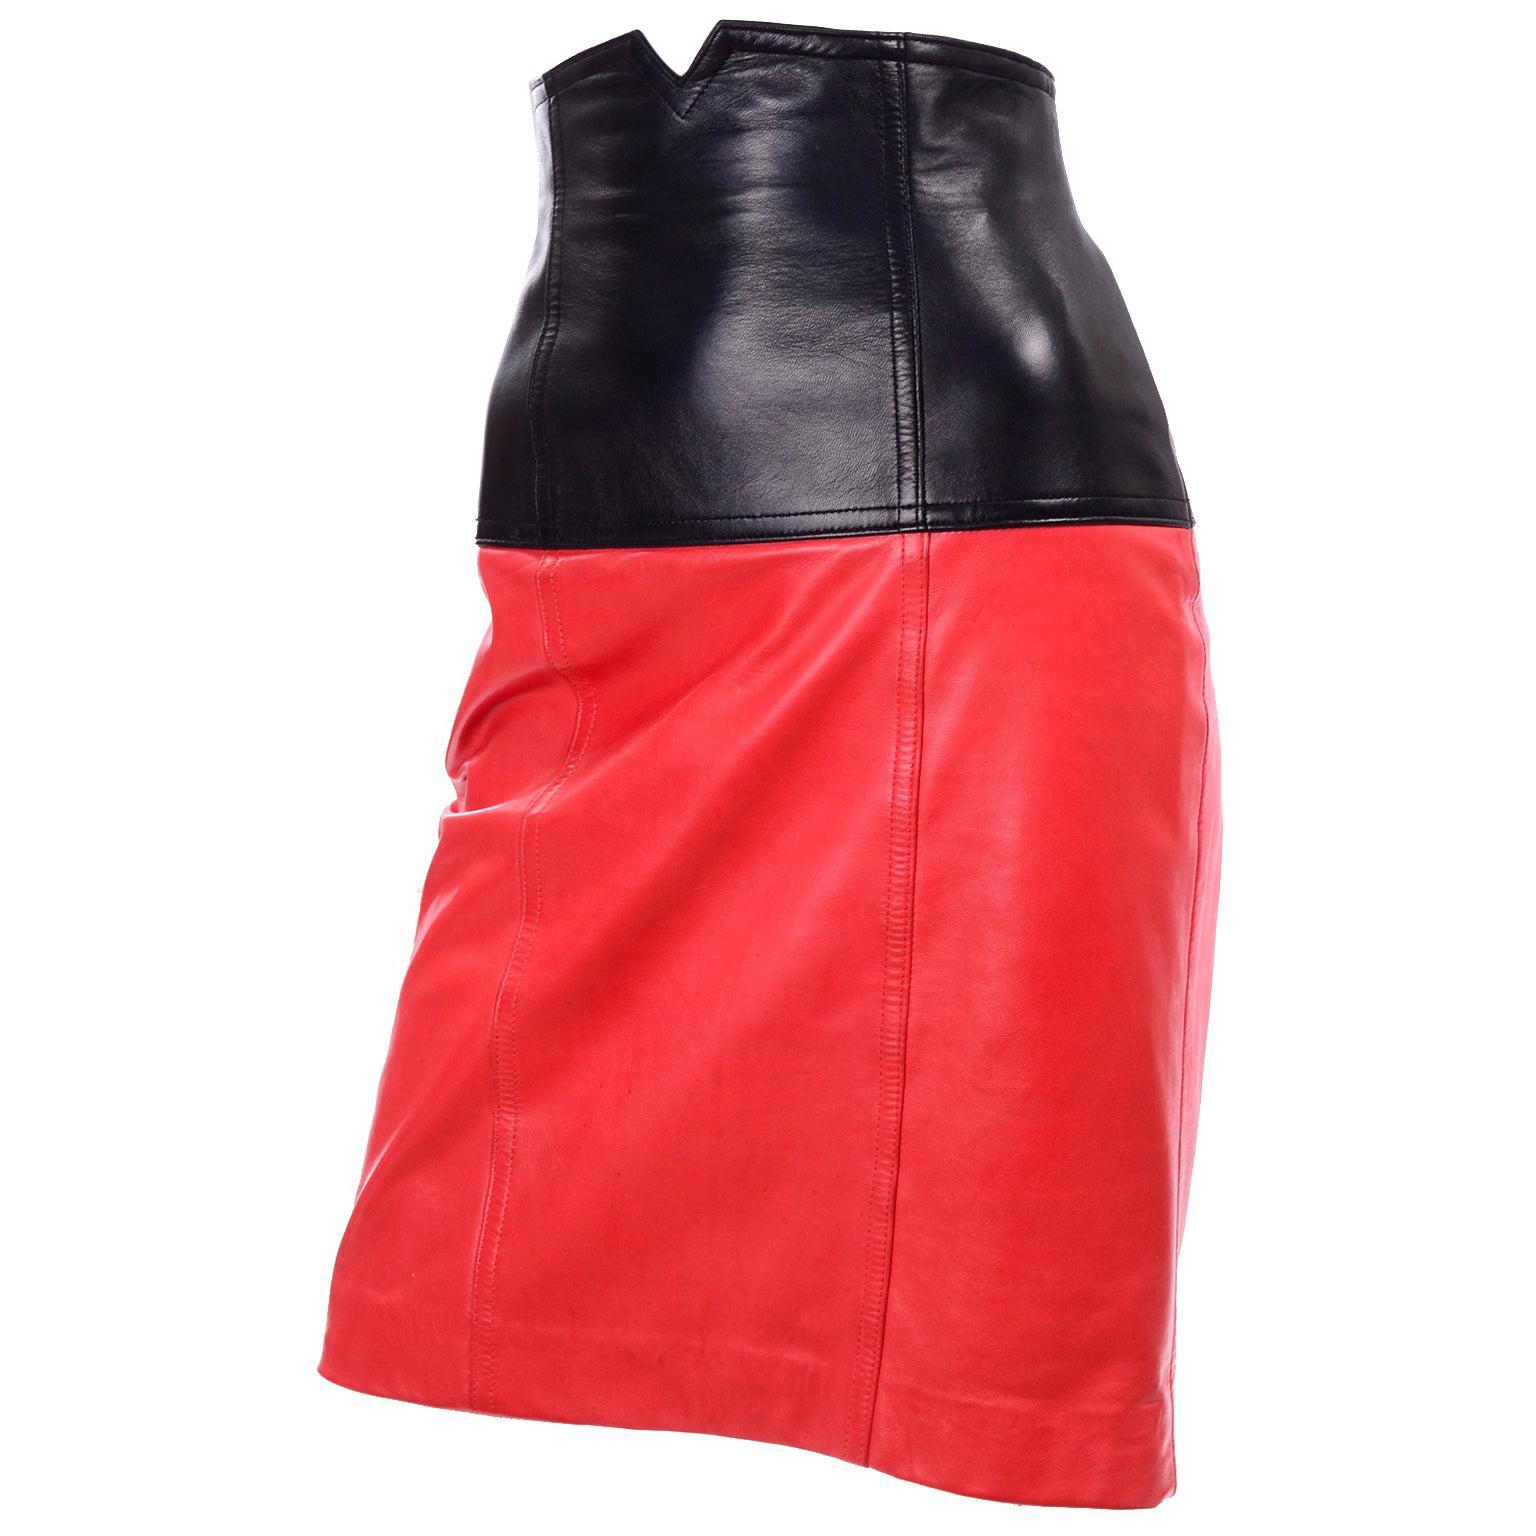 1980s Escada Margaretha Ley Vintage Red & Black Color Block Leather Skirt